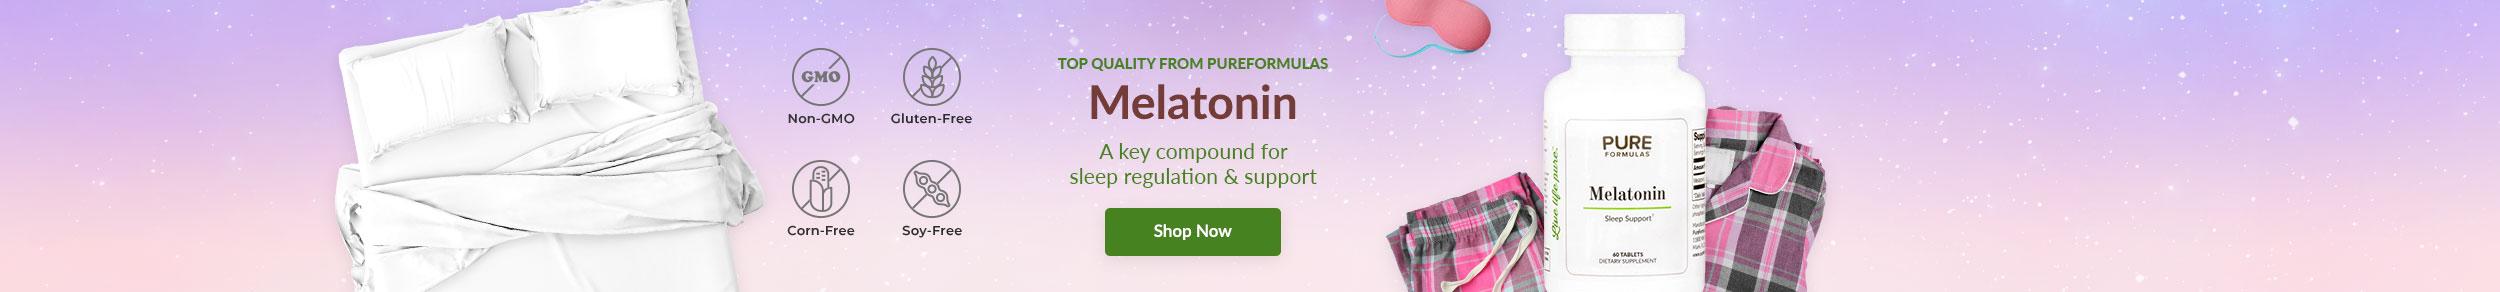 https://i3.pureformulas.net/images/static/Pureformulas-Sleep-Support-Melatonin_slide2_071618.jpg